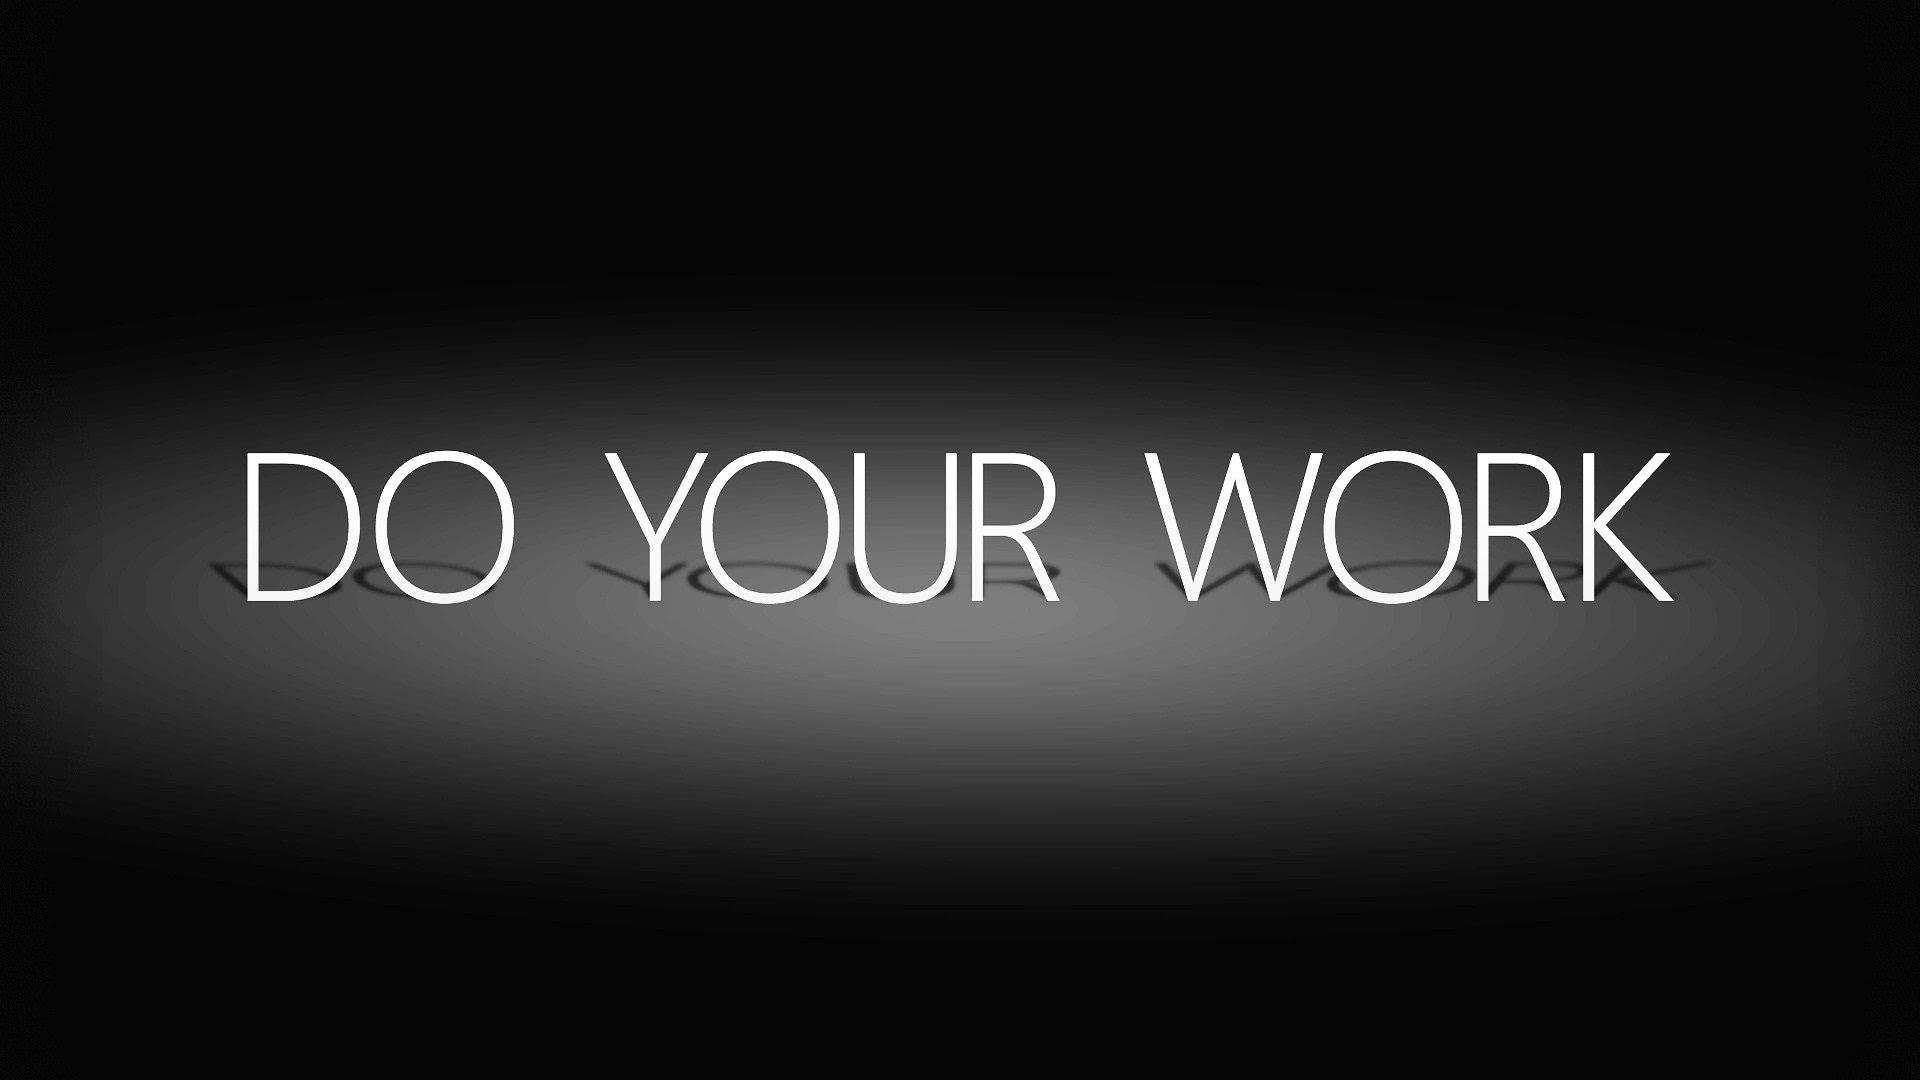 Do Your Work Cohren